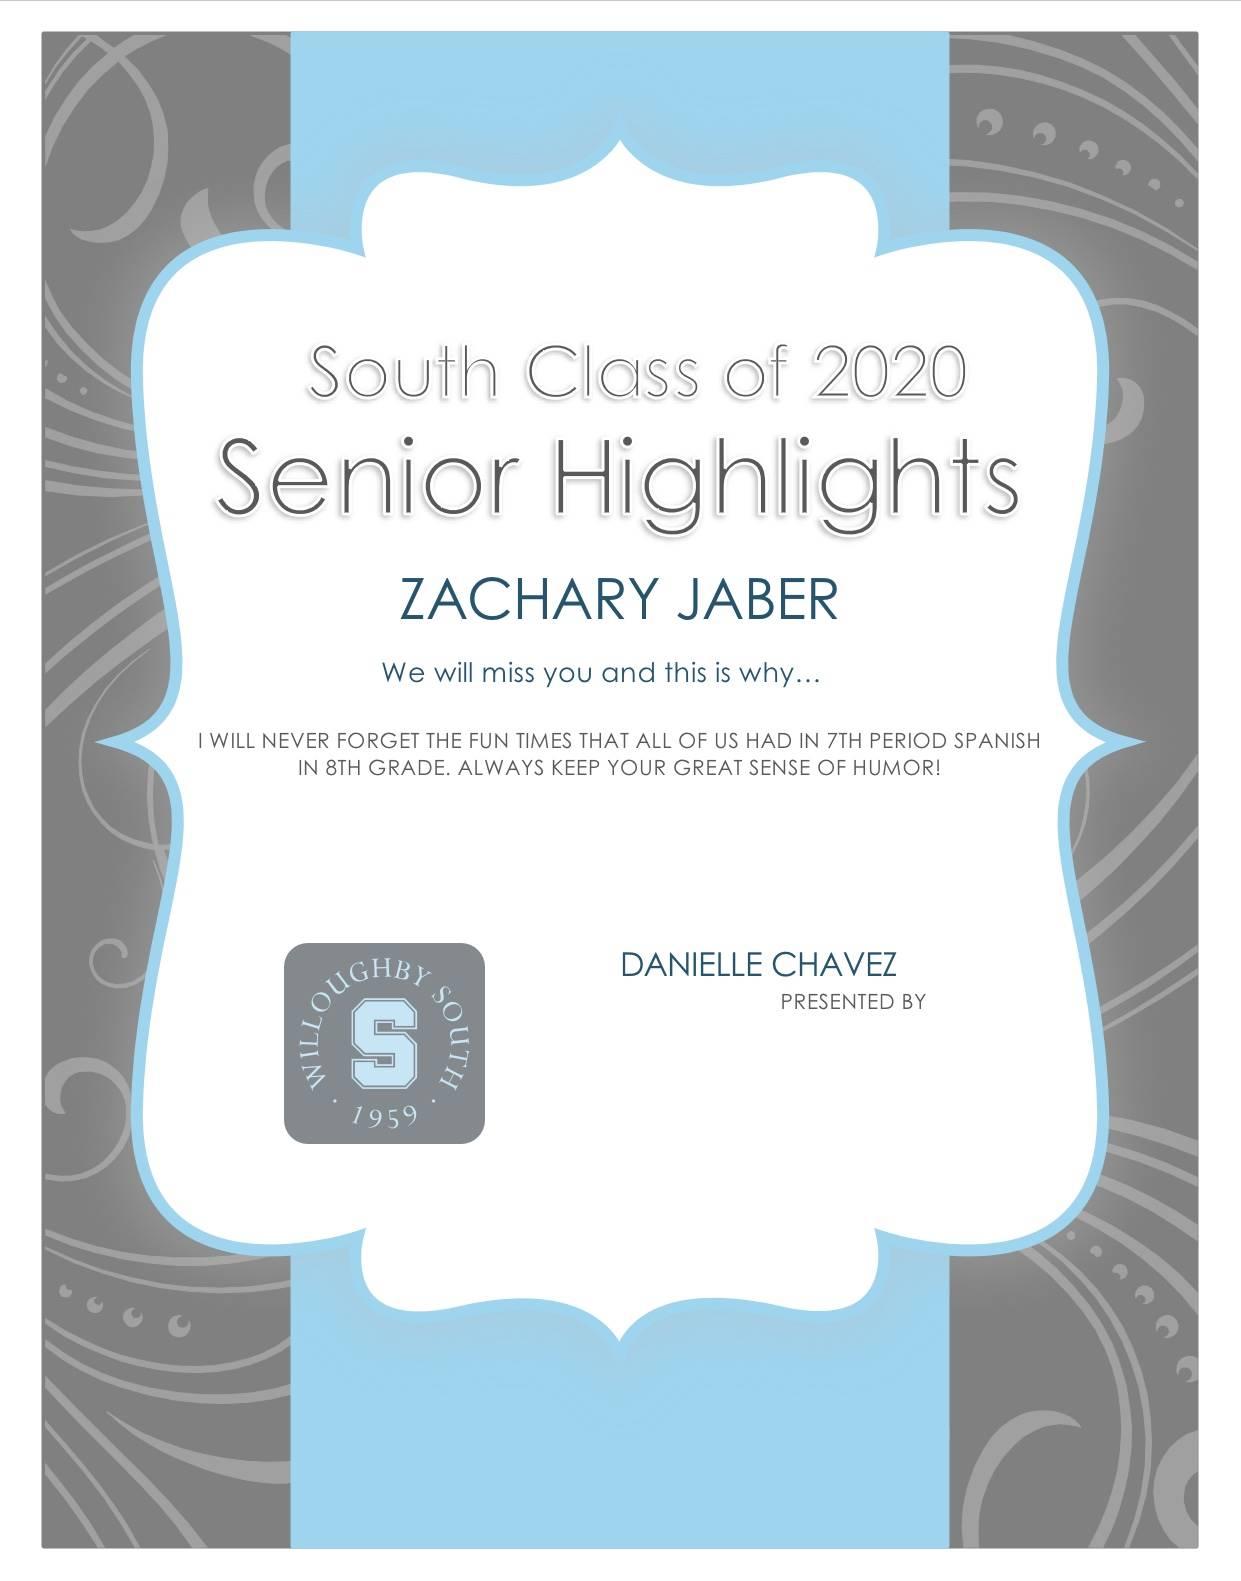 Zachary Jaber